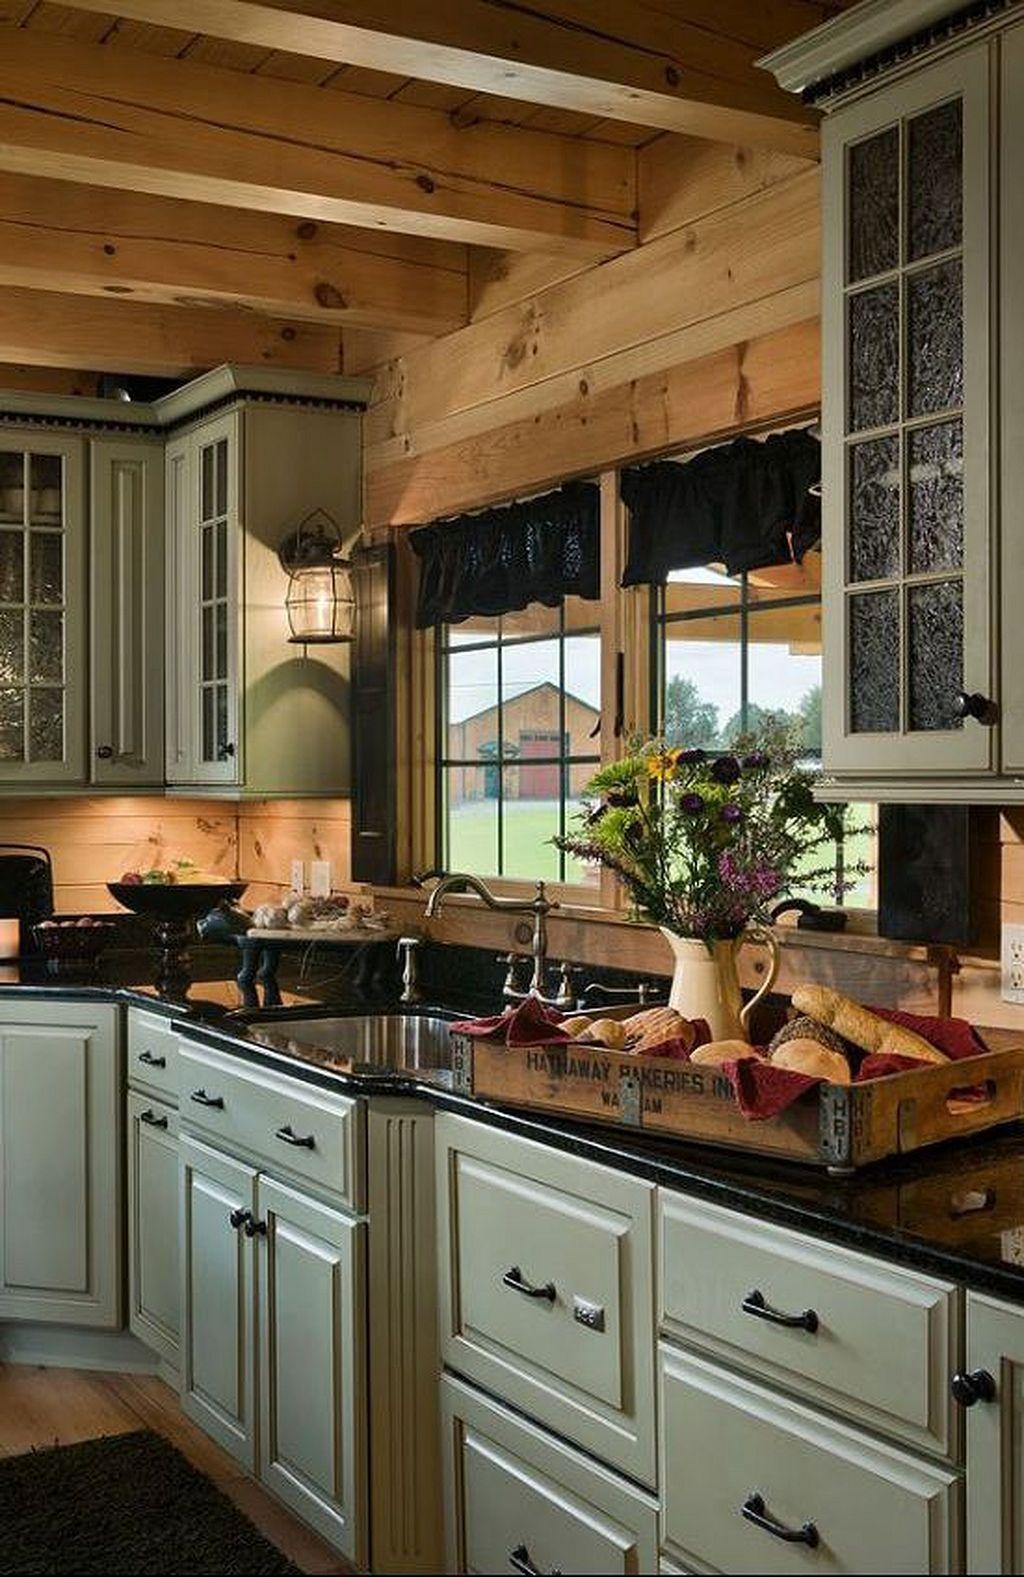 72 Log Cabin Kitchen Ideas Log Home Kitchens Rustic Kitchen Design Country Style Kitchen